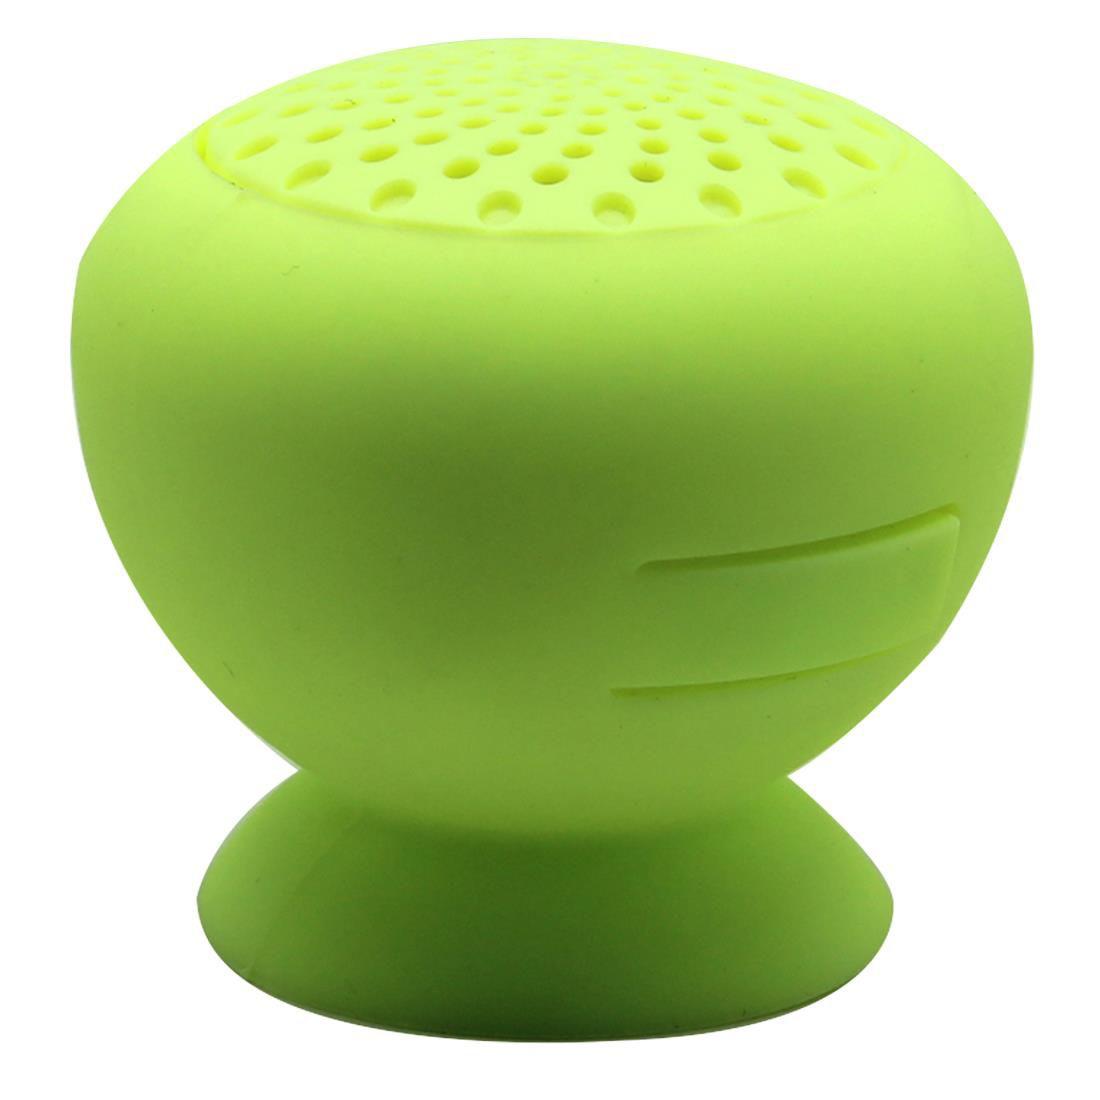 Mini Bluetooth Speaker Portable Wireless Hands free Car Kit Speaker Mushroom Shape Waterproof Silicone Suction